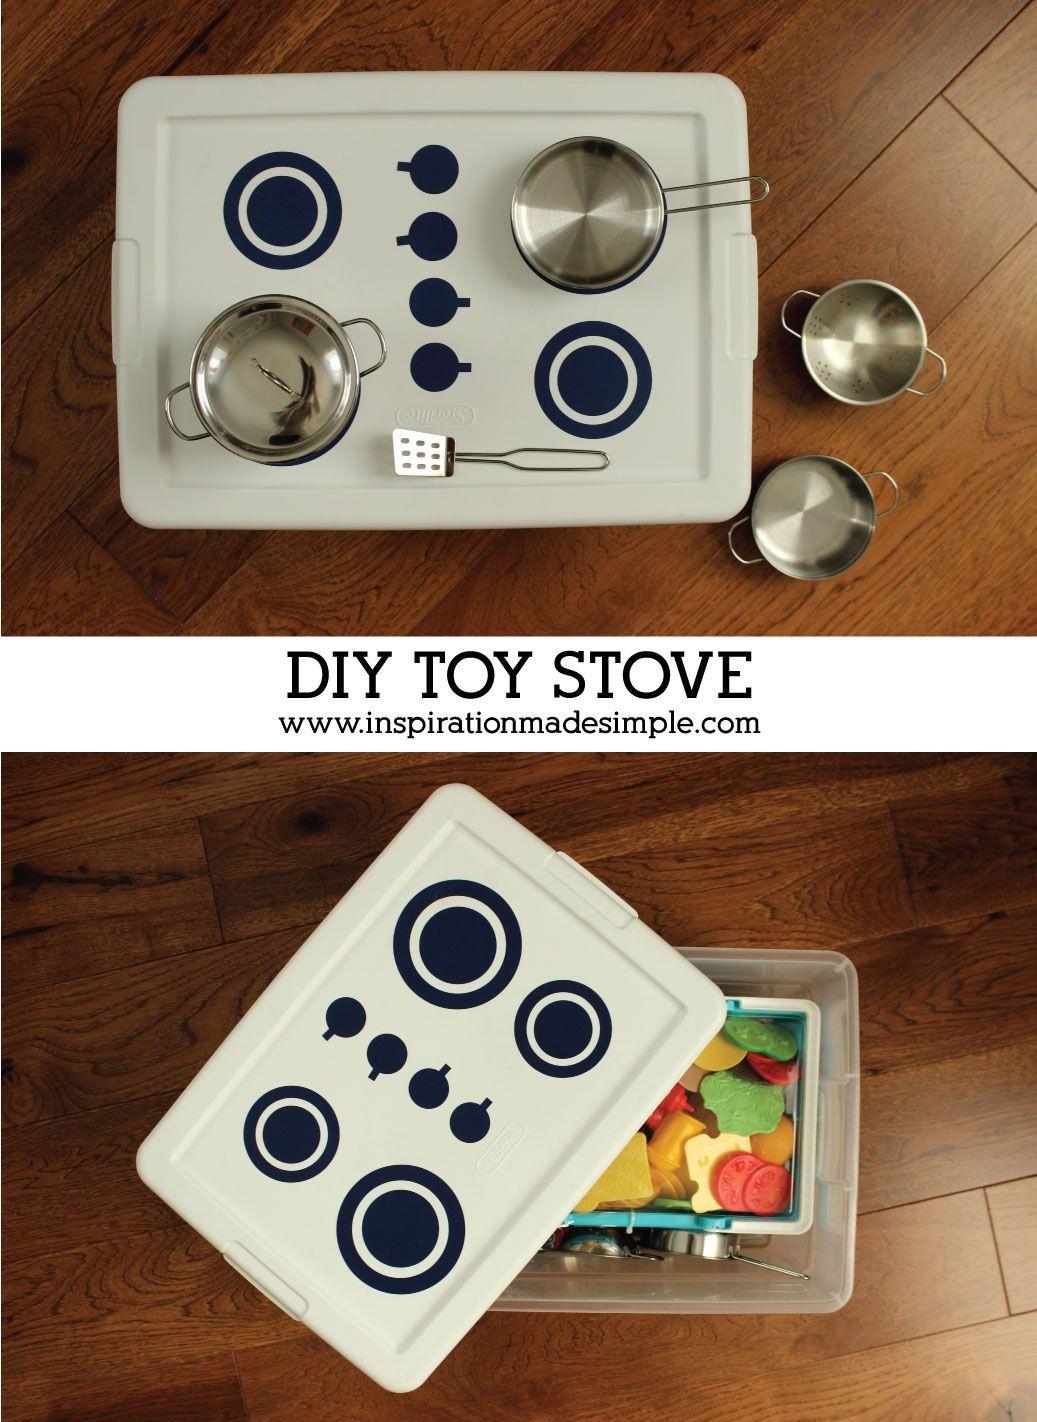 Diy Play Tote Stove In